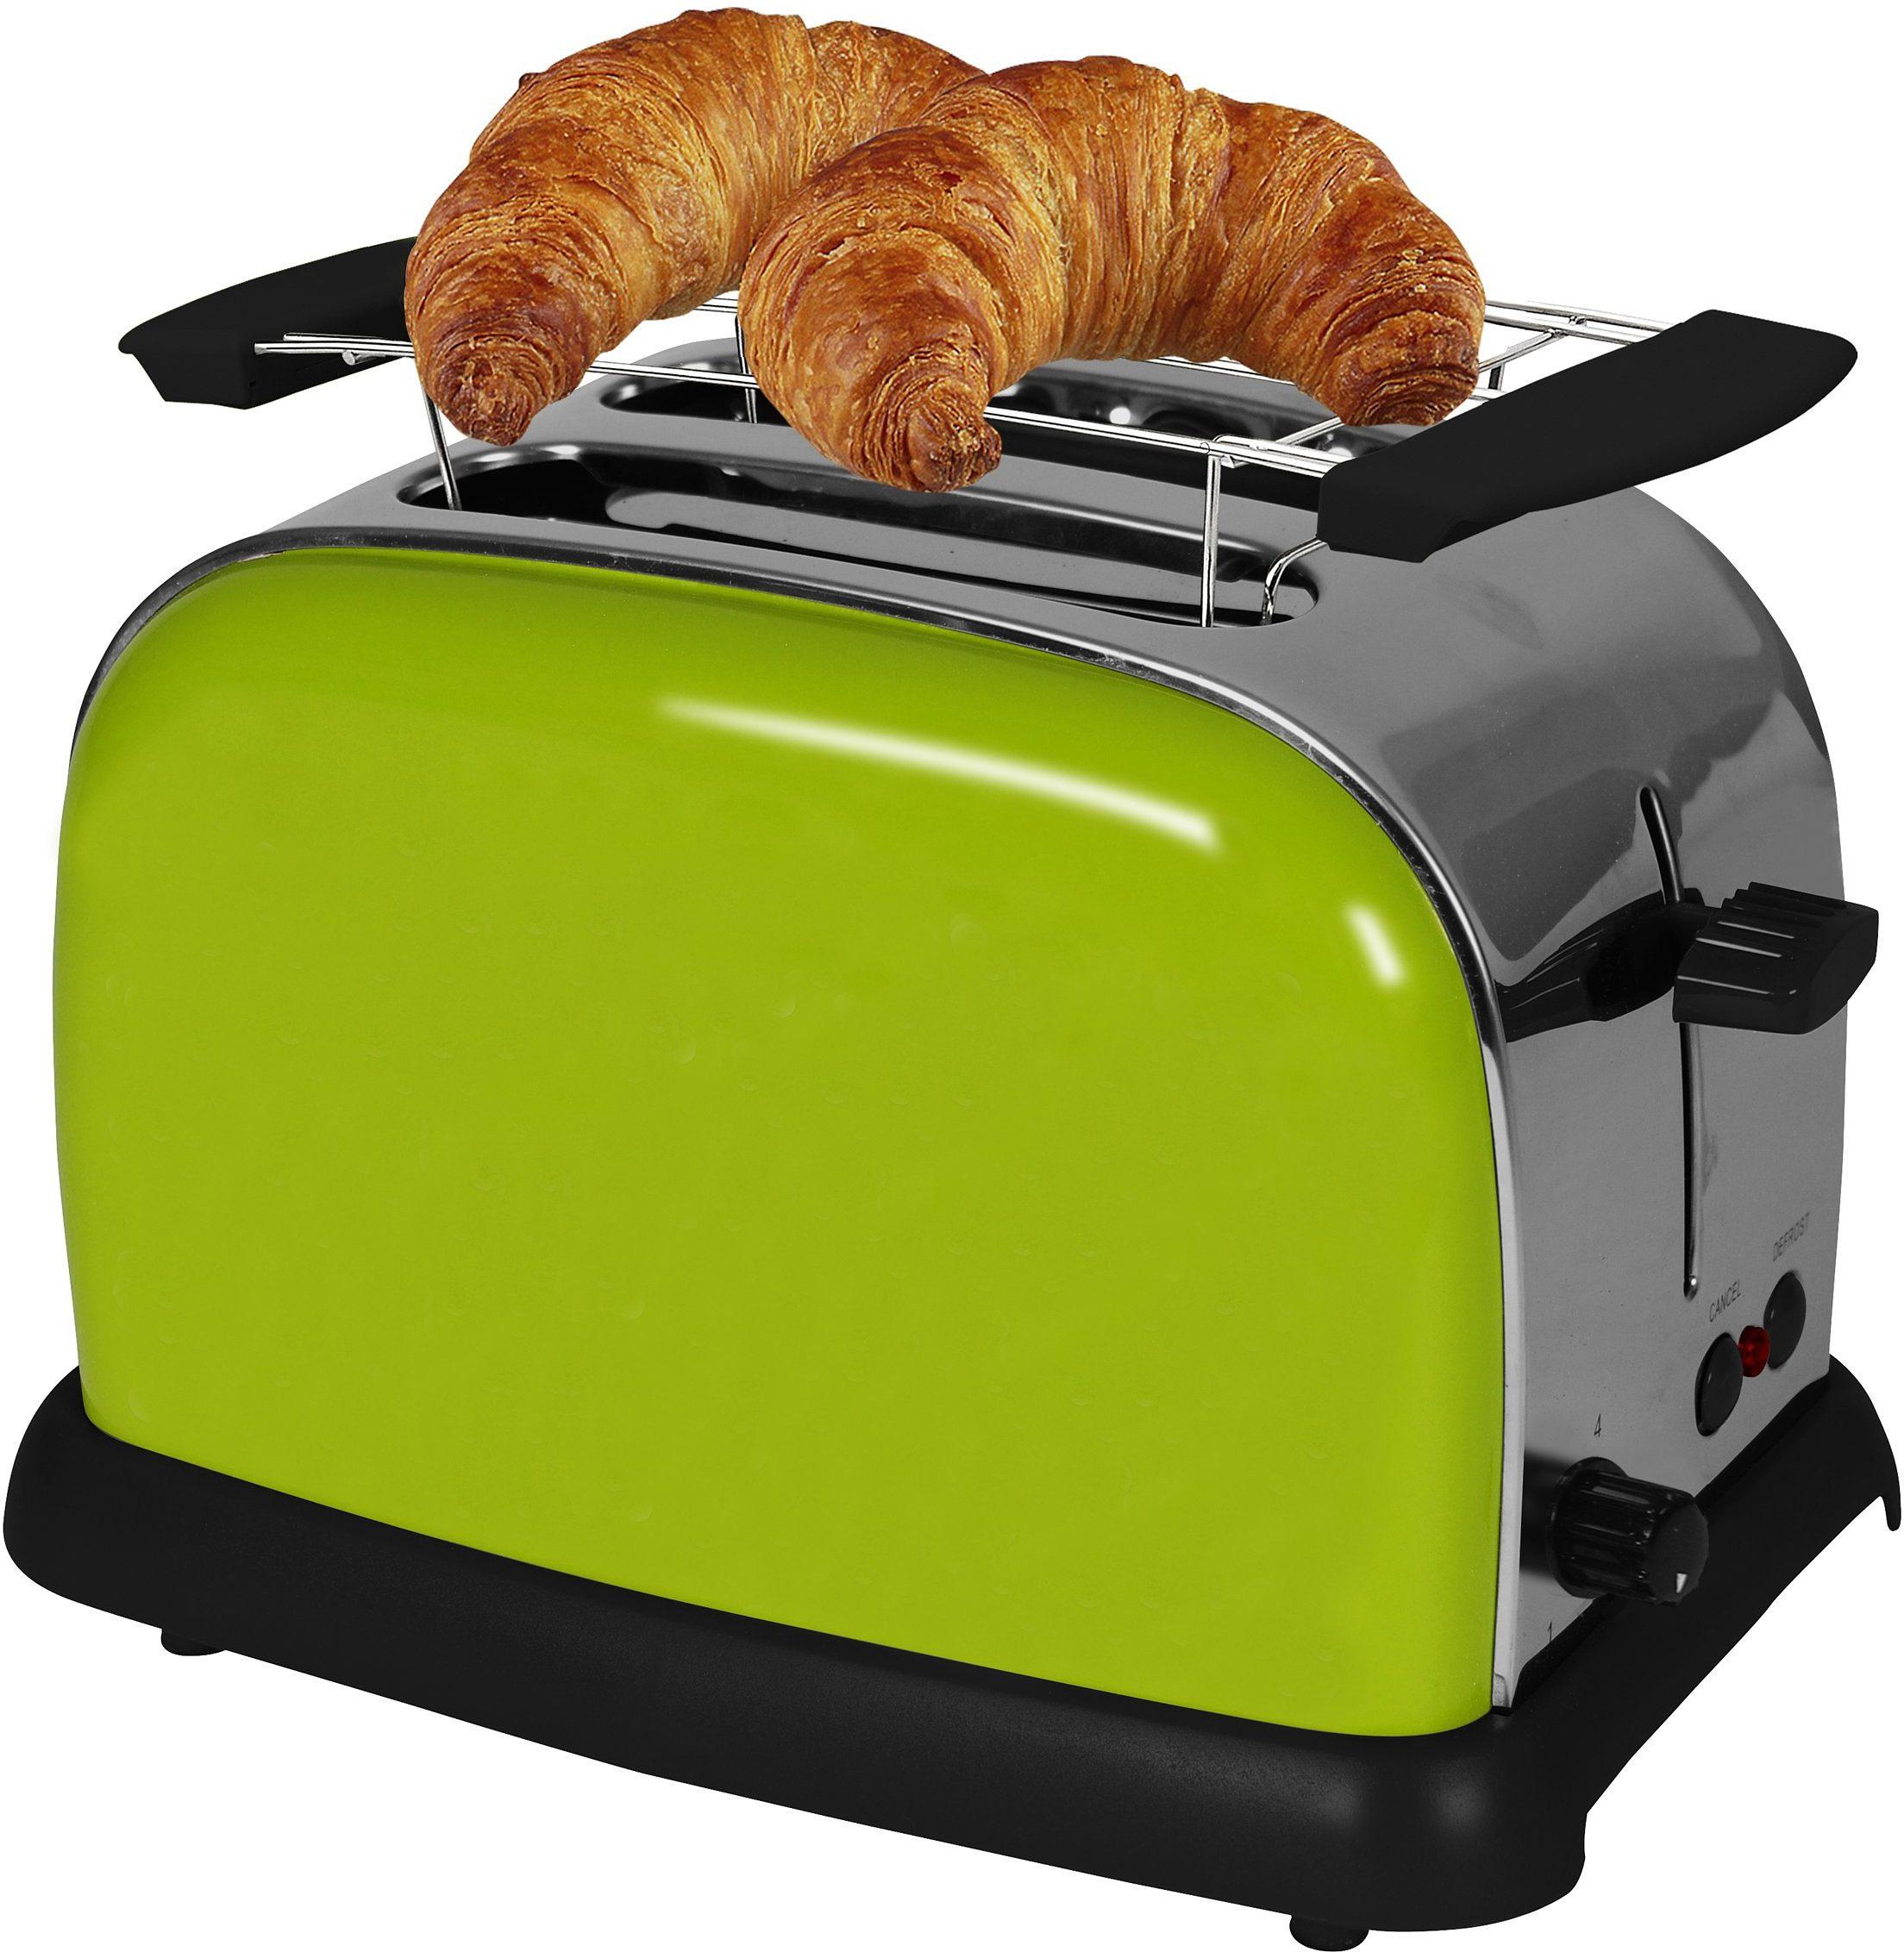 TEAM KALORIK Toaster »TKG TO 1008 AG«, für 2 Scheiben